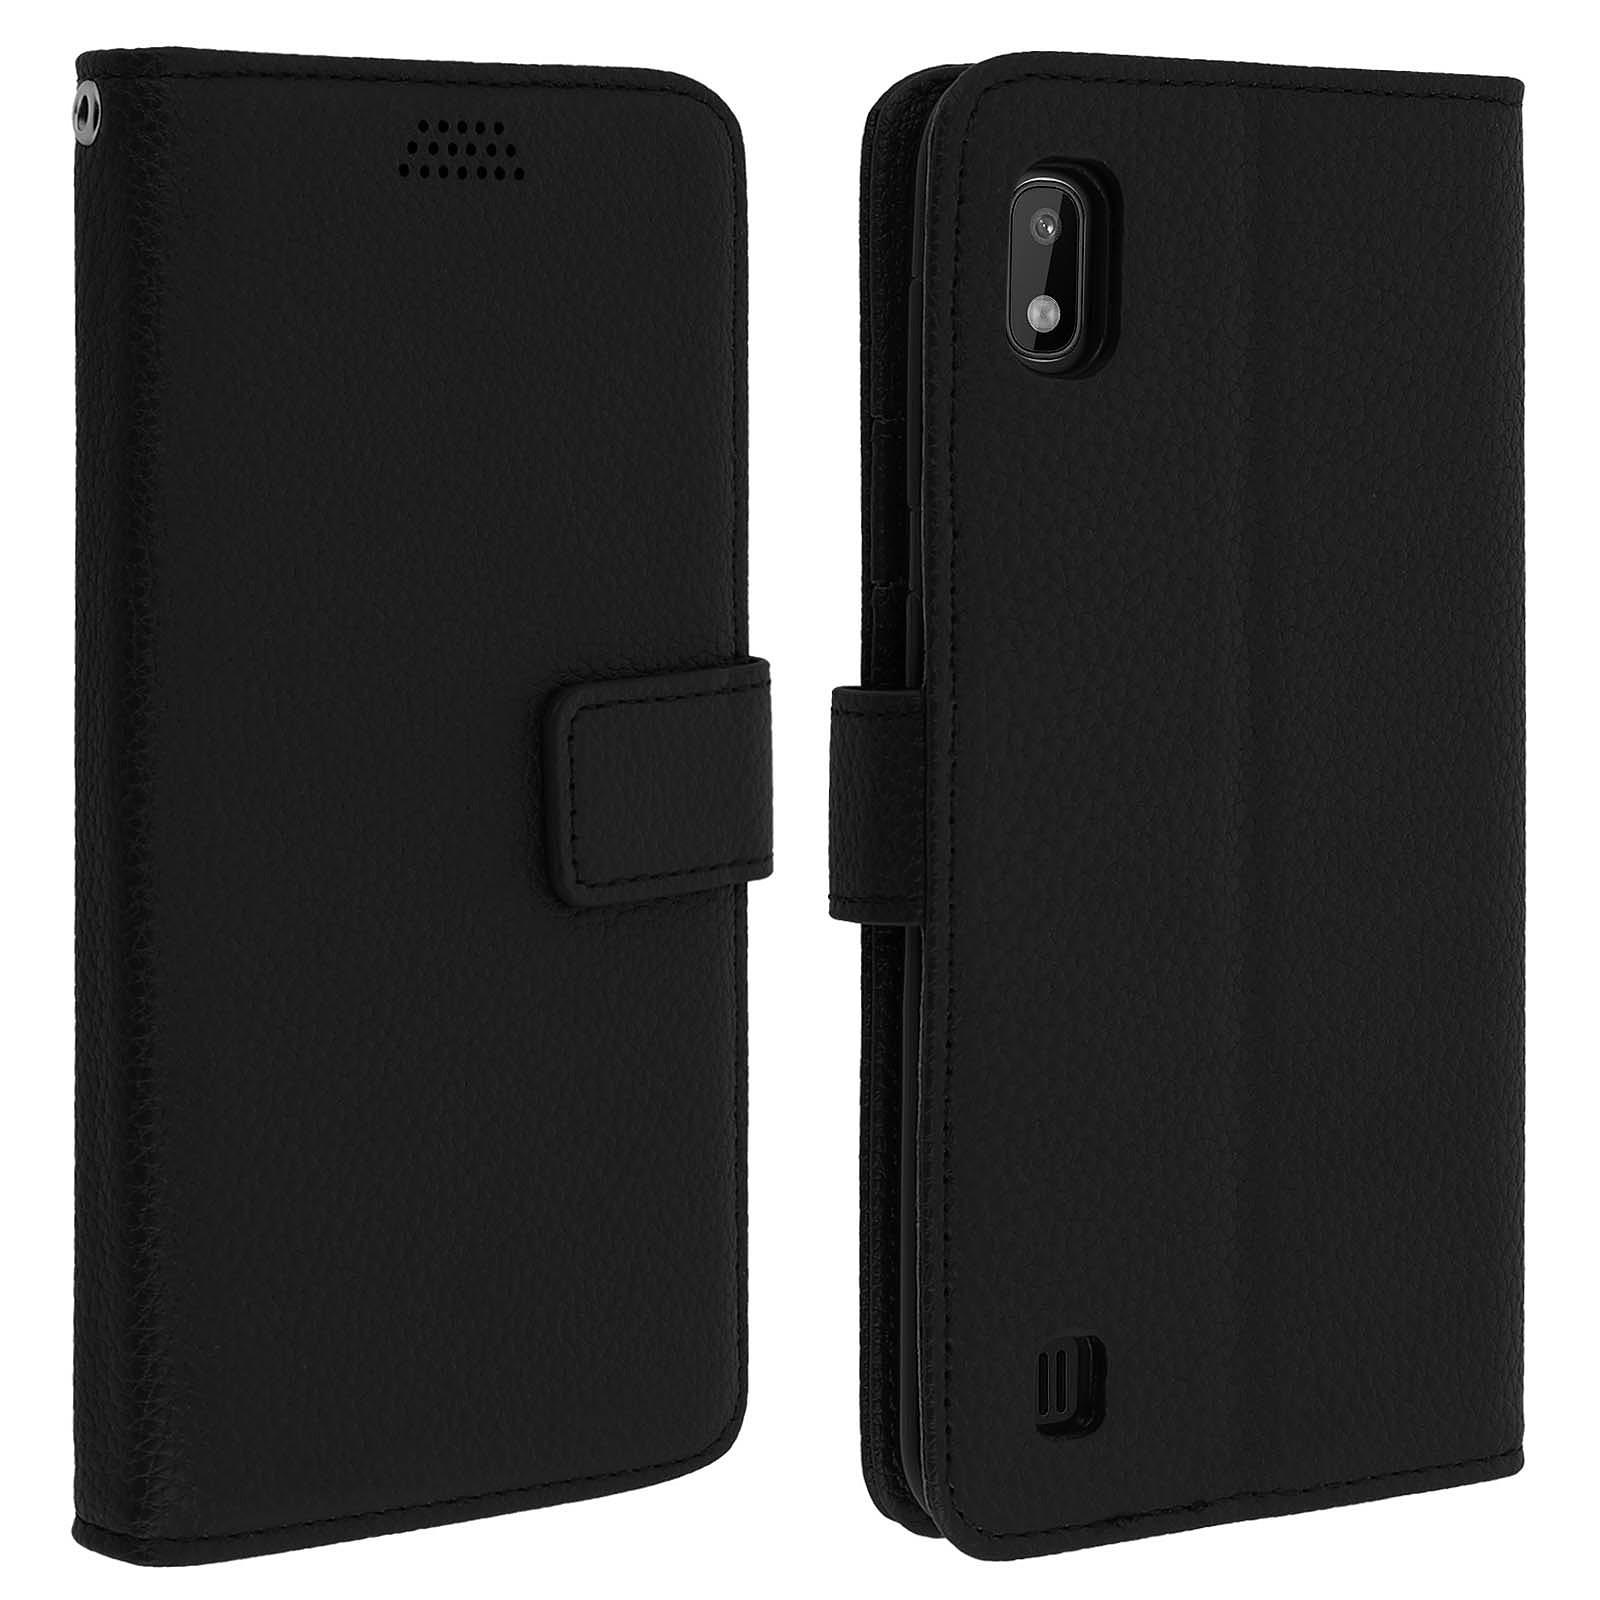 Avizar Etui folio Noir pour Samsung Galaxy A10